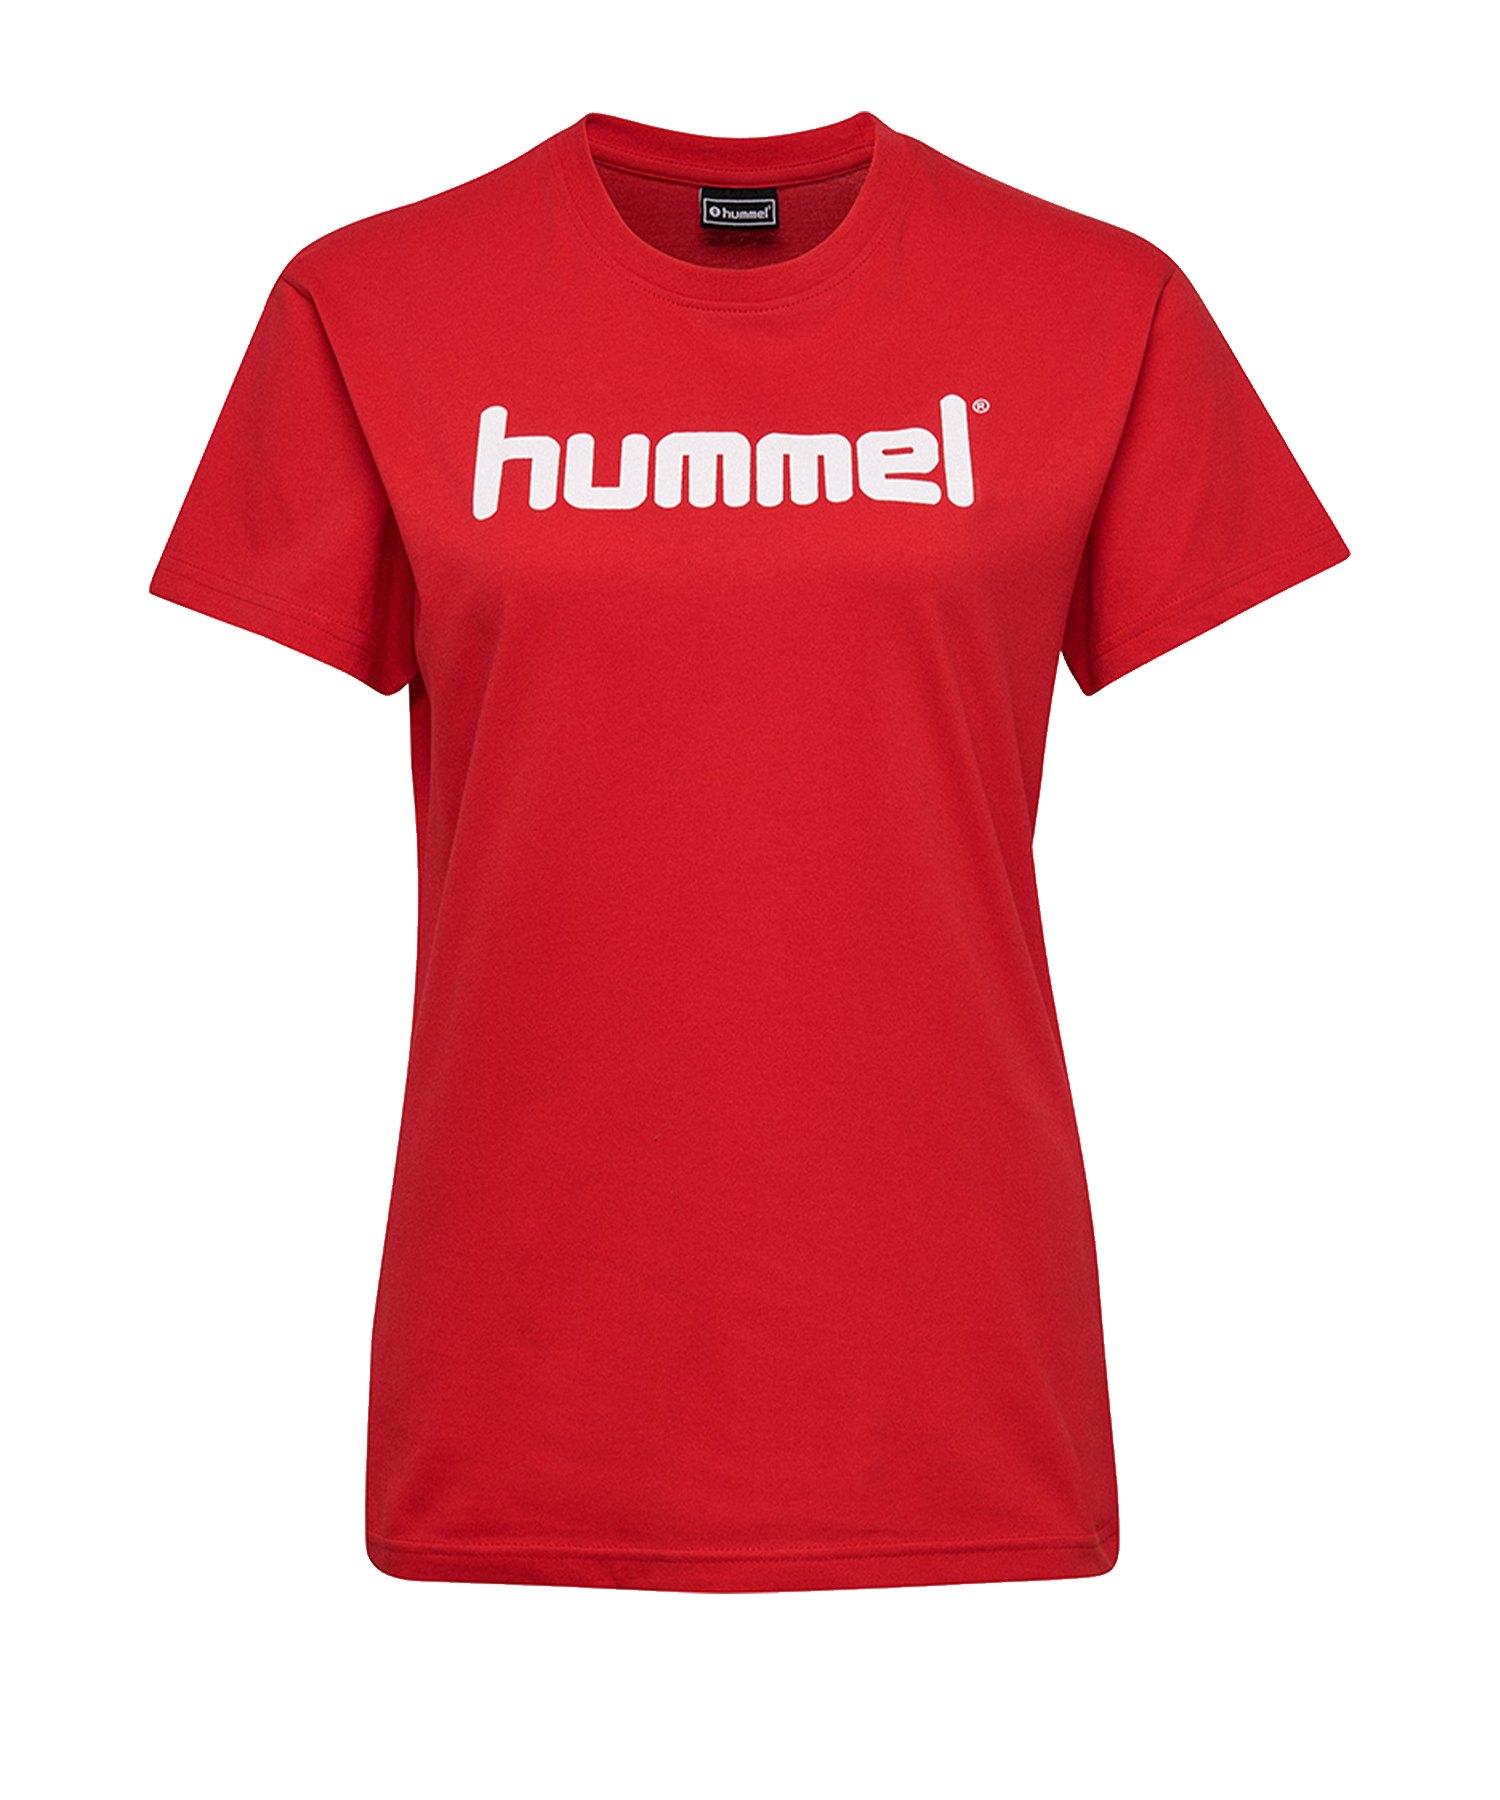 Hummel Cotton T-Shirt Logo Damen Rot F3062 - Rot